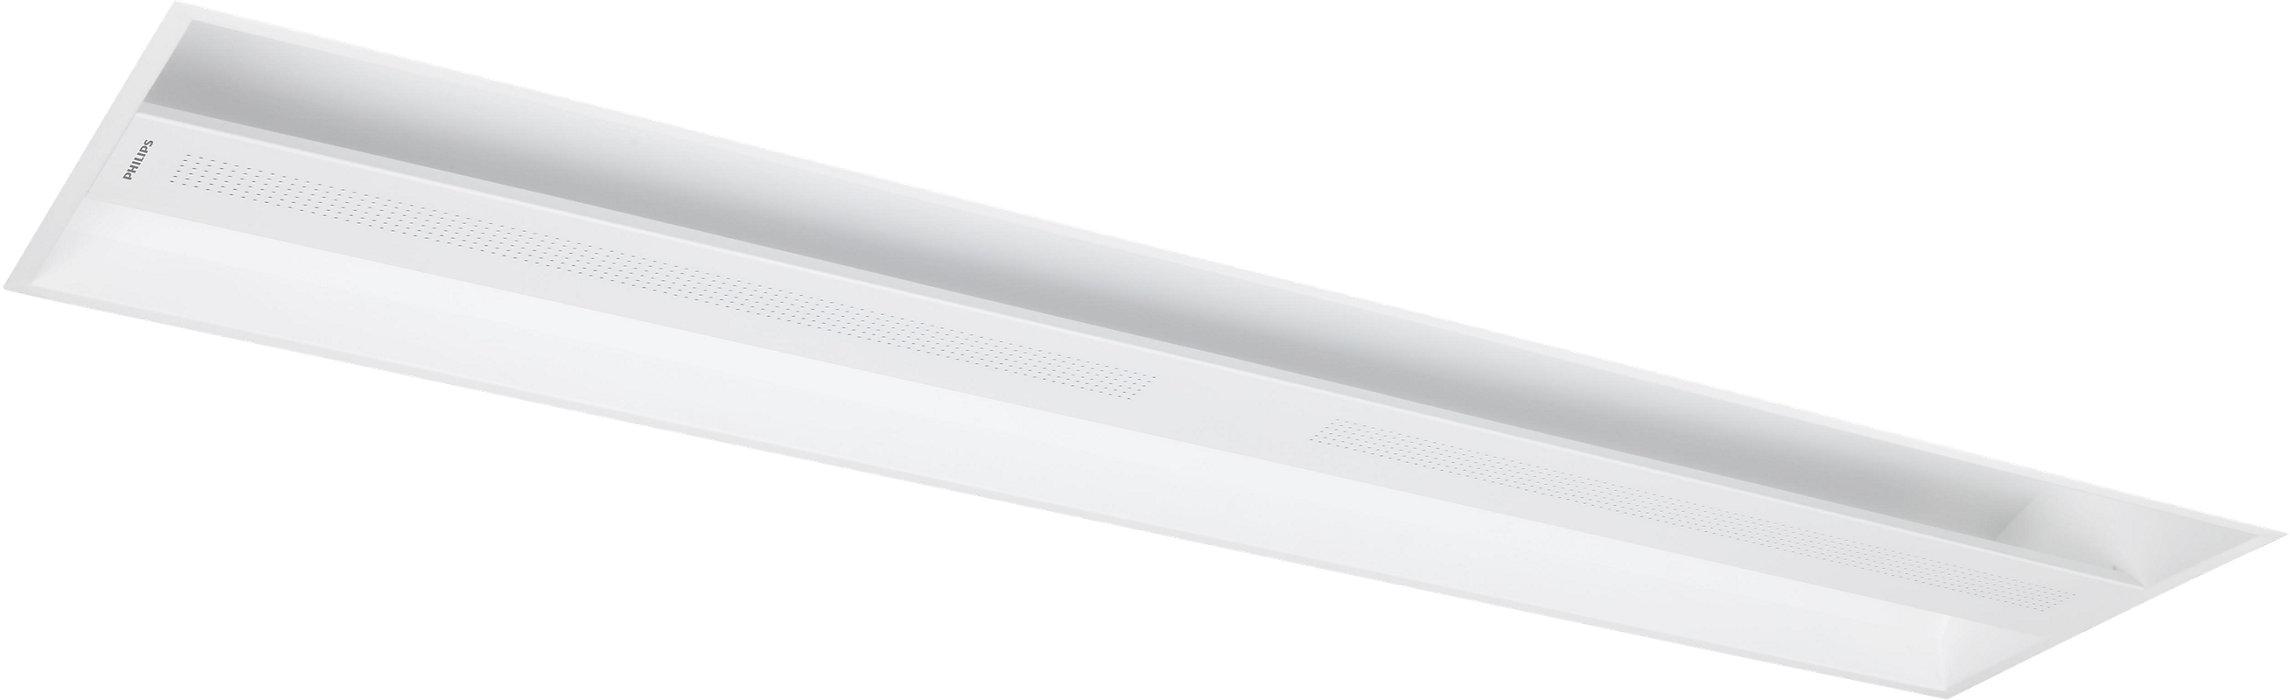 Soft and uniform light for visual comfort